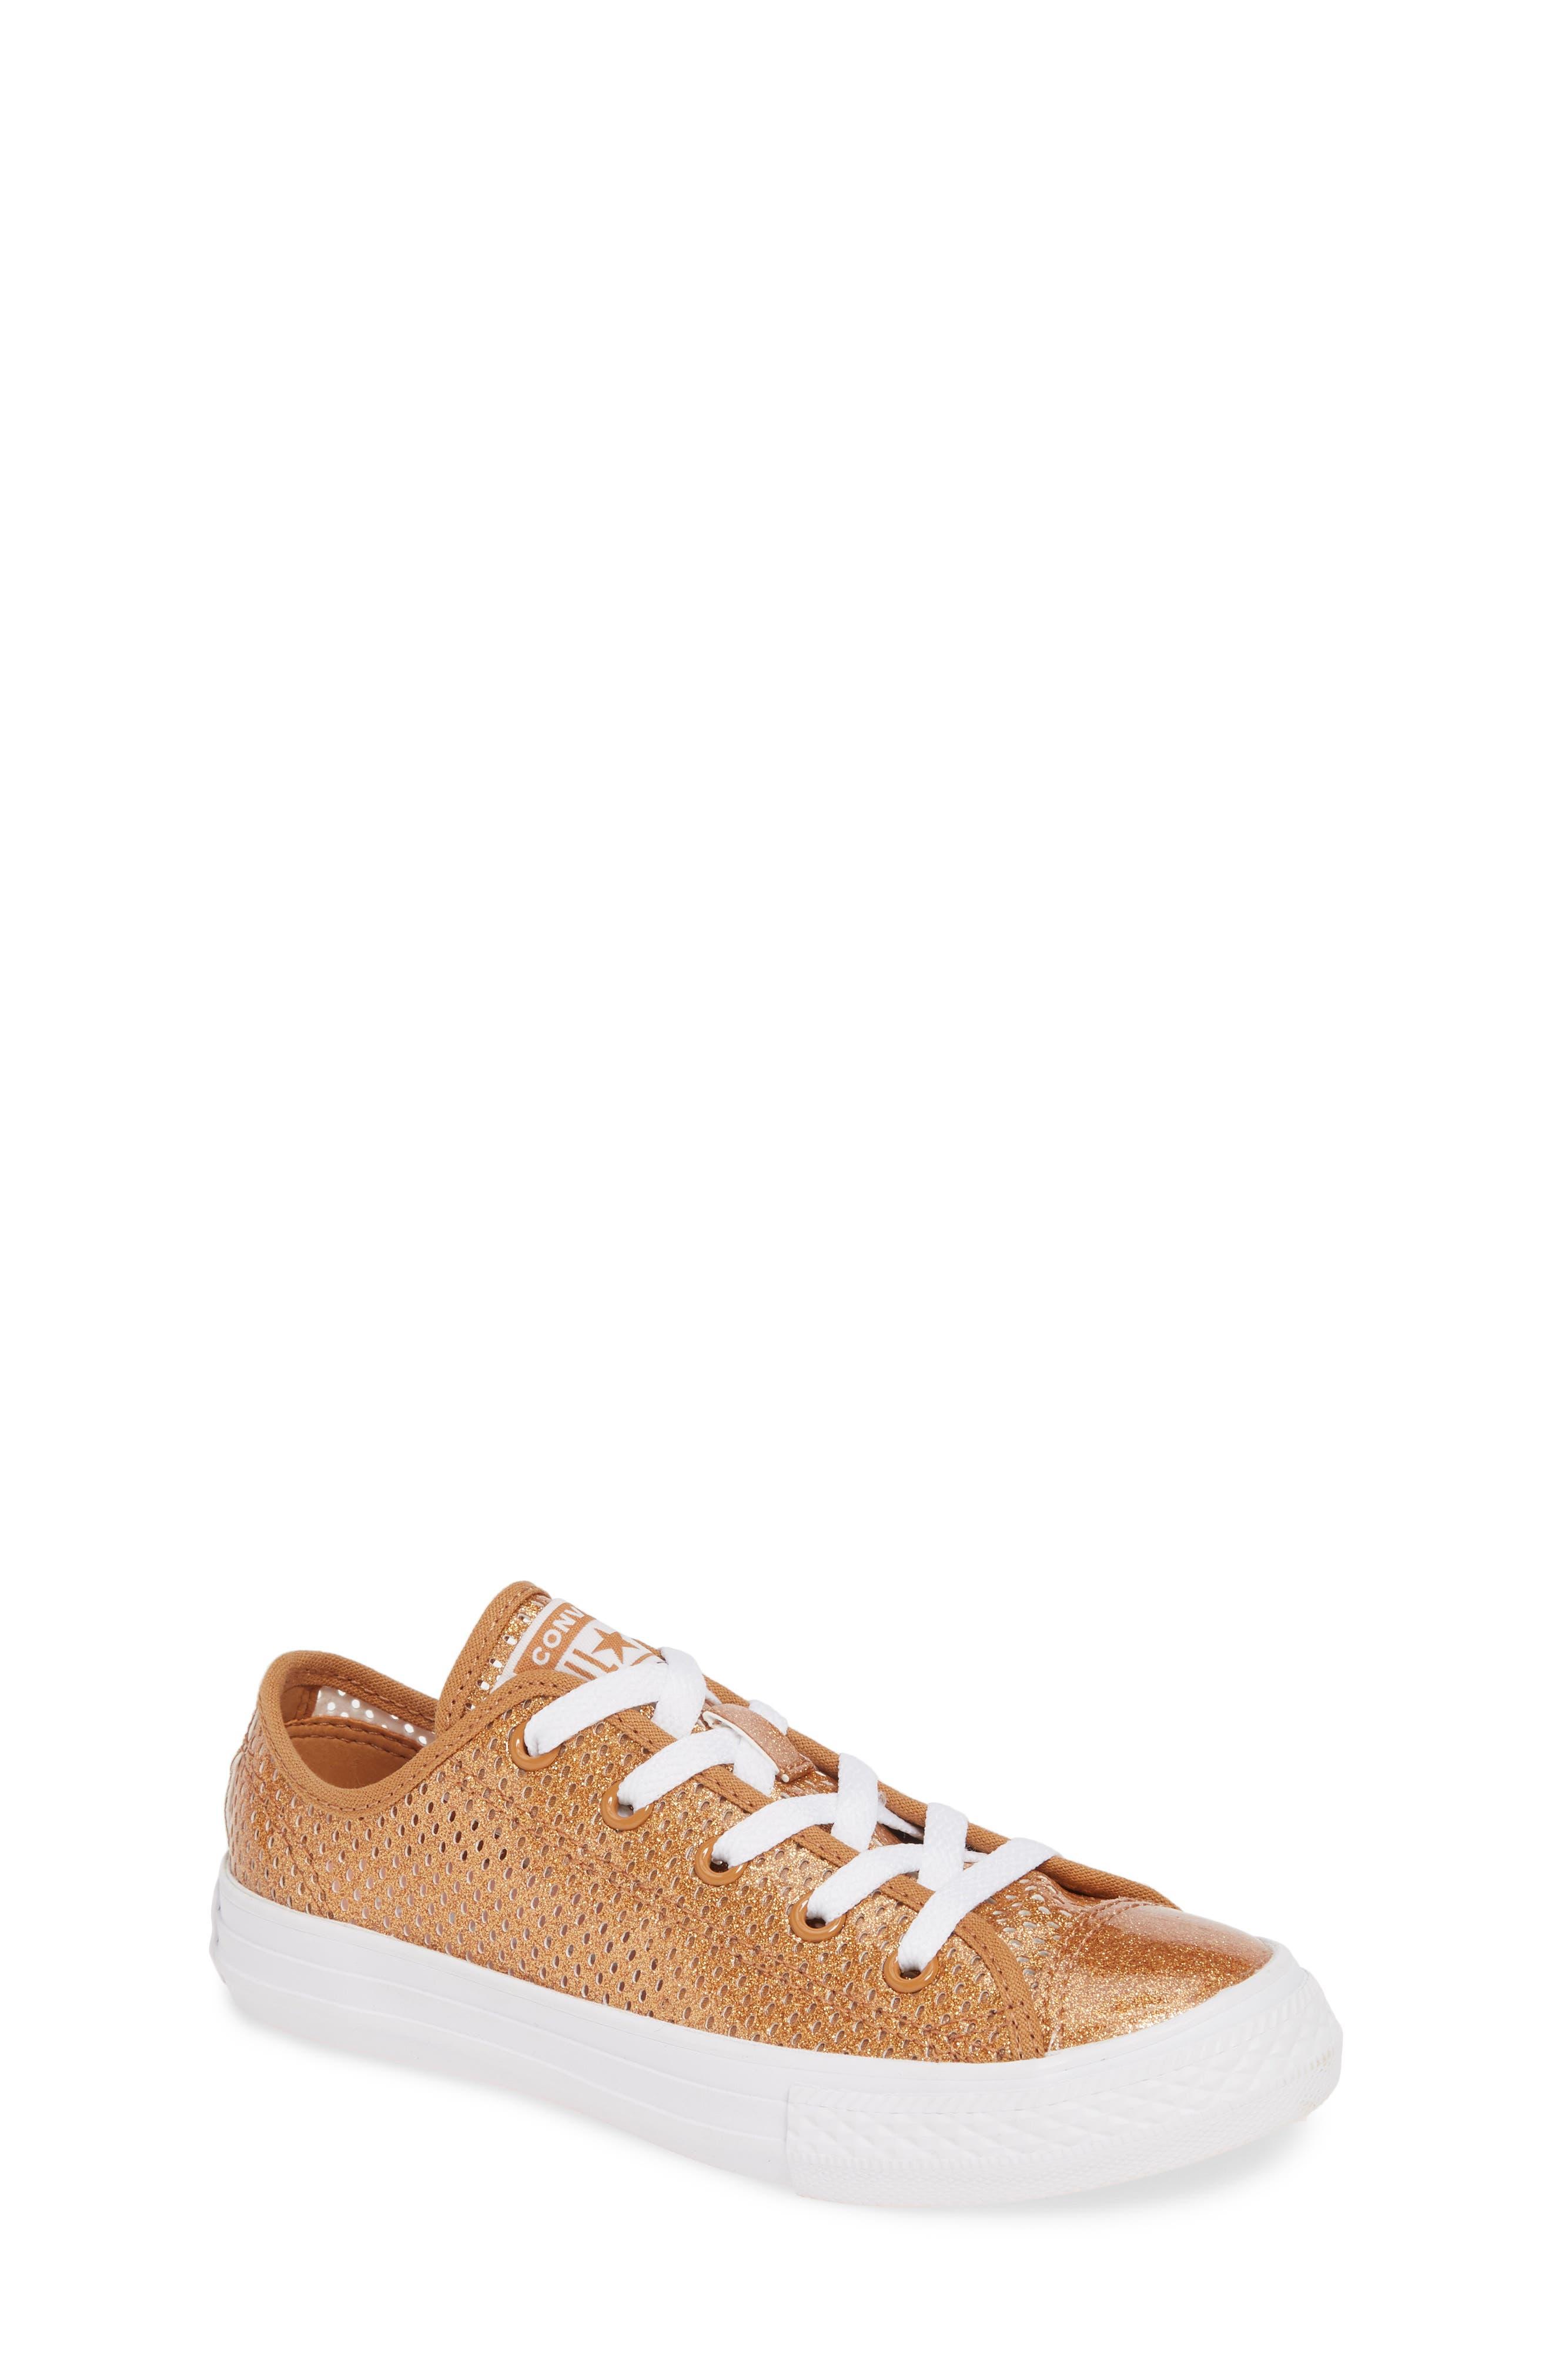 Converse Chuck Taylor All Star Glitter Mesh Low Top Sneaker